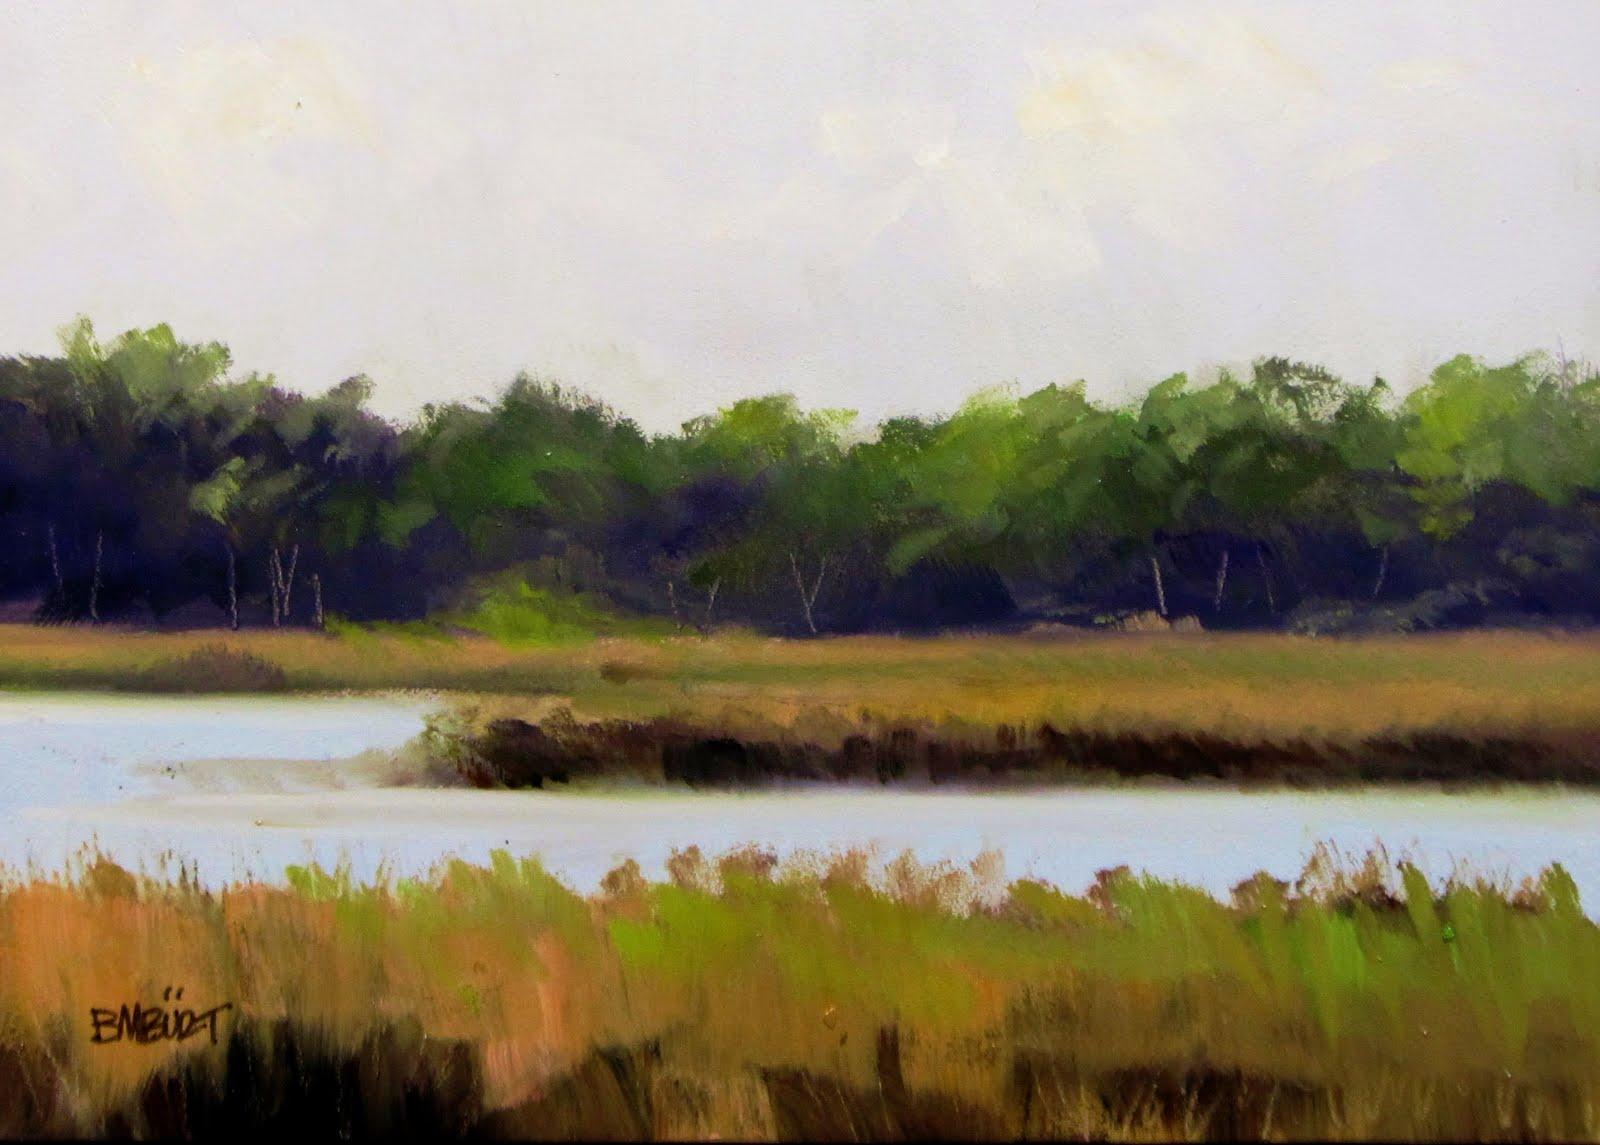 """ART 4 DIAPERS (DAILY DIAPER #157) South Carolina Marsh"" original fine art by Brian Burt"